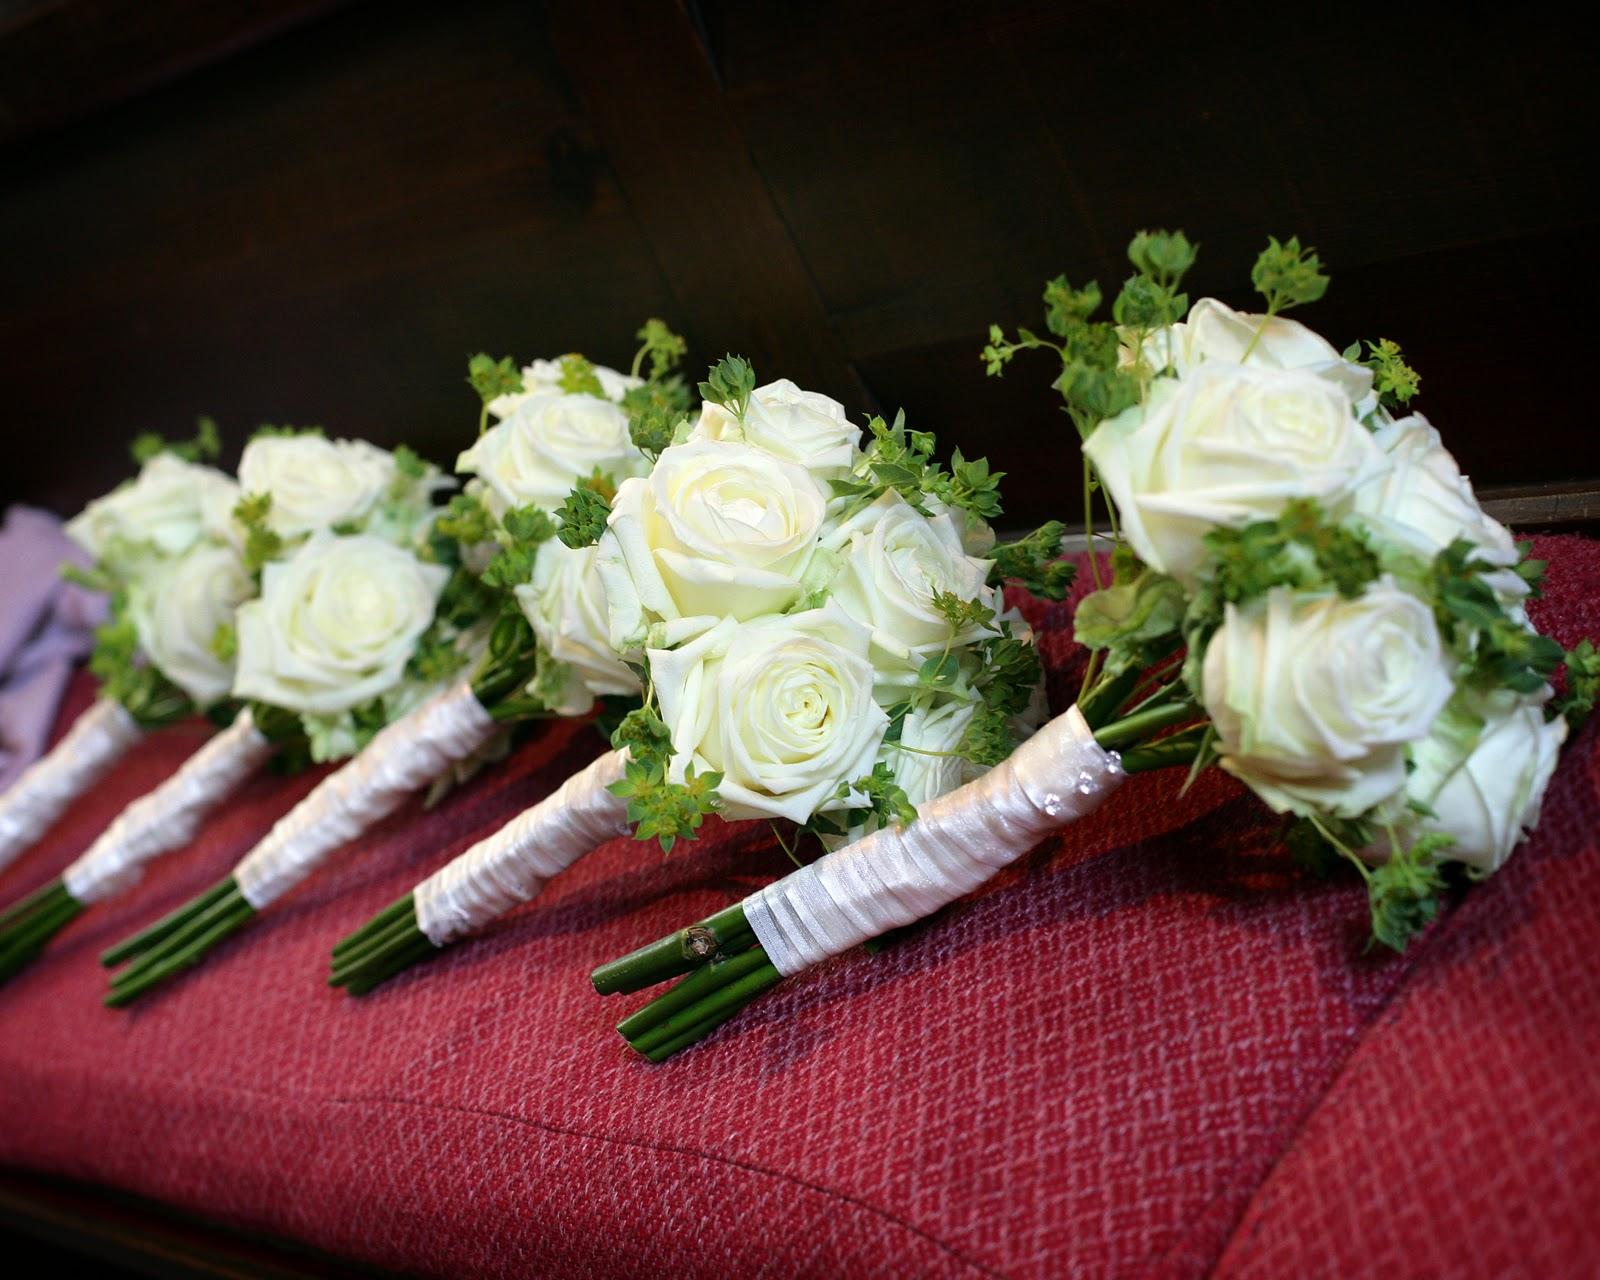 Blush Bespoke Flowers Blog: How Much Do Wedding Flowers Cost?